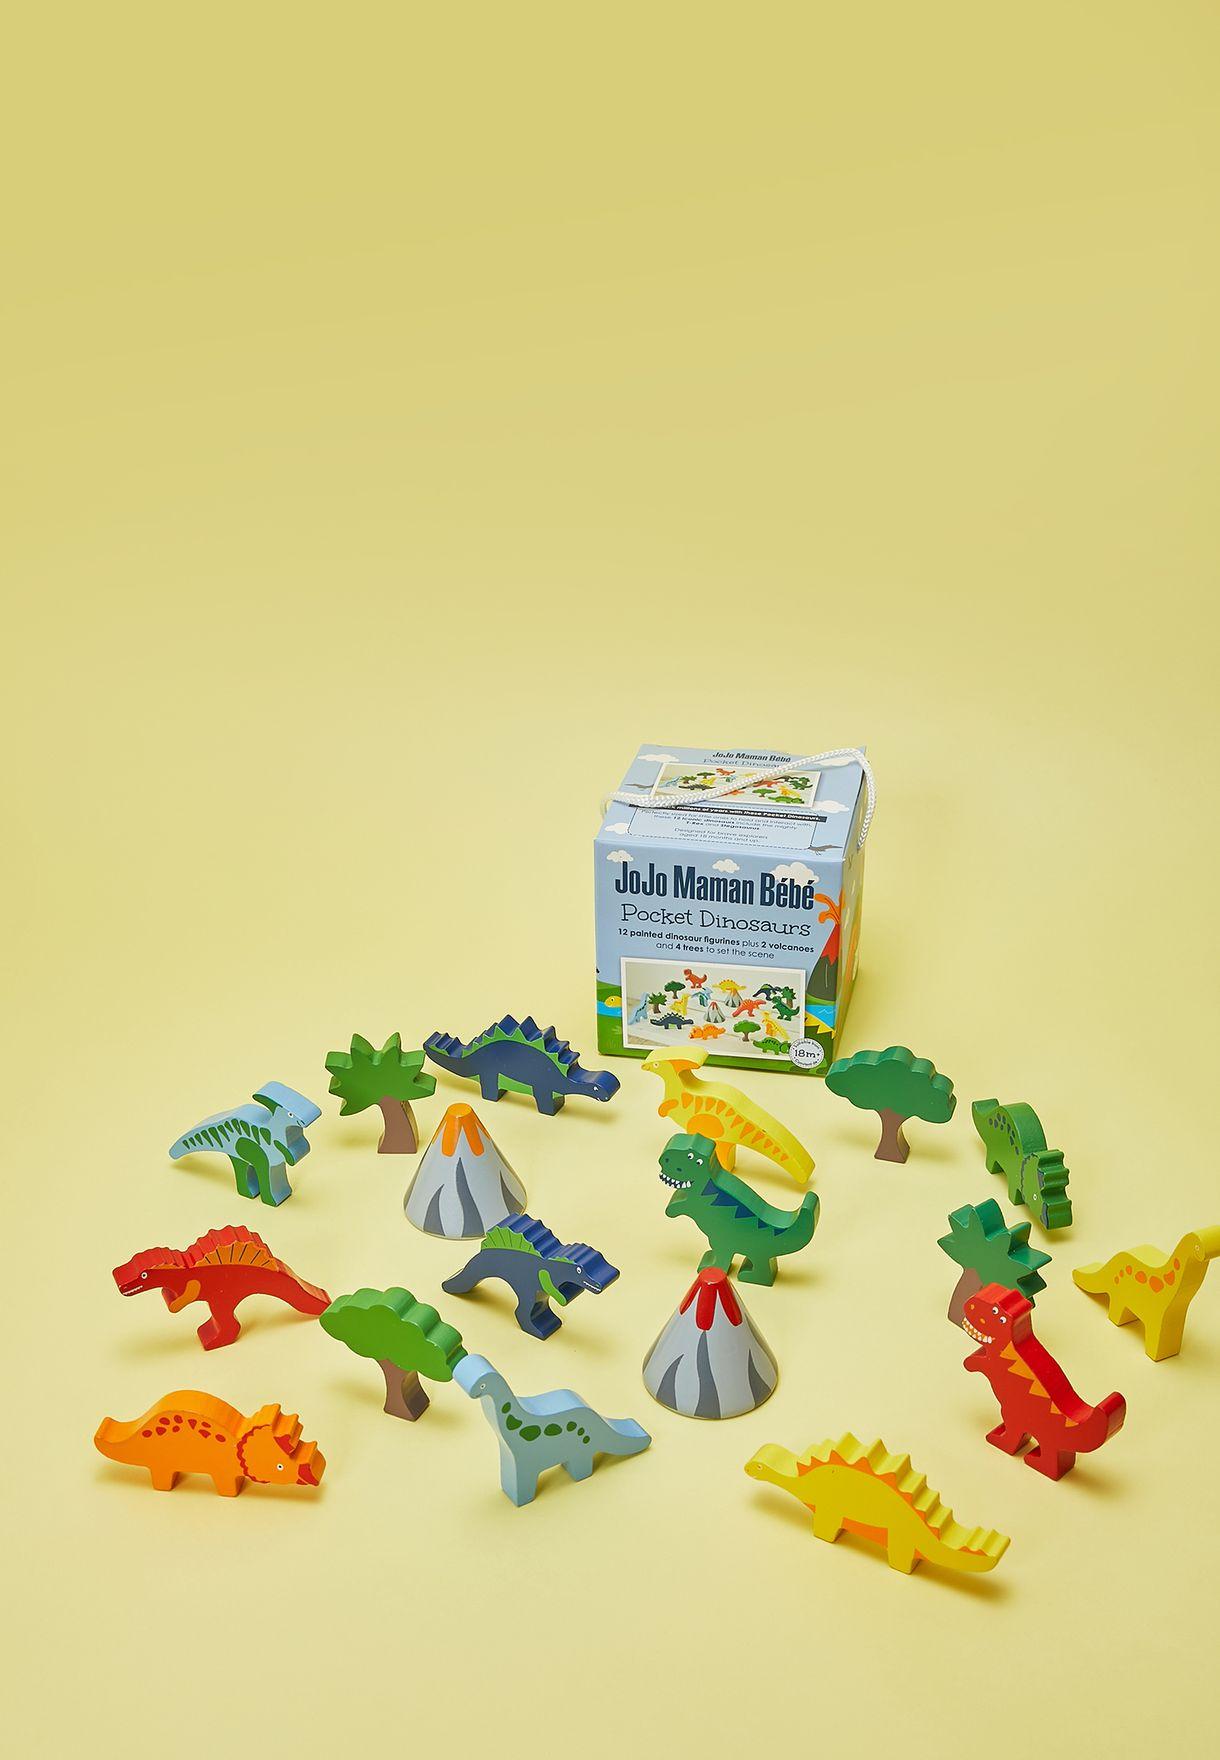 Pocket Dinosaurs Game